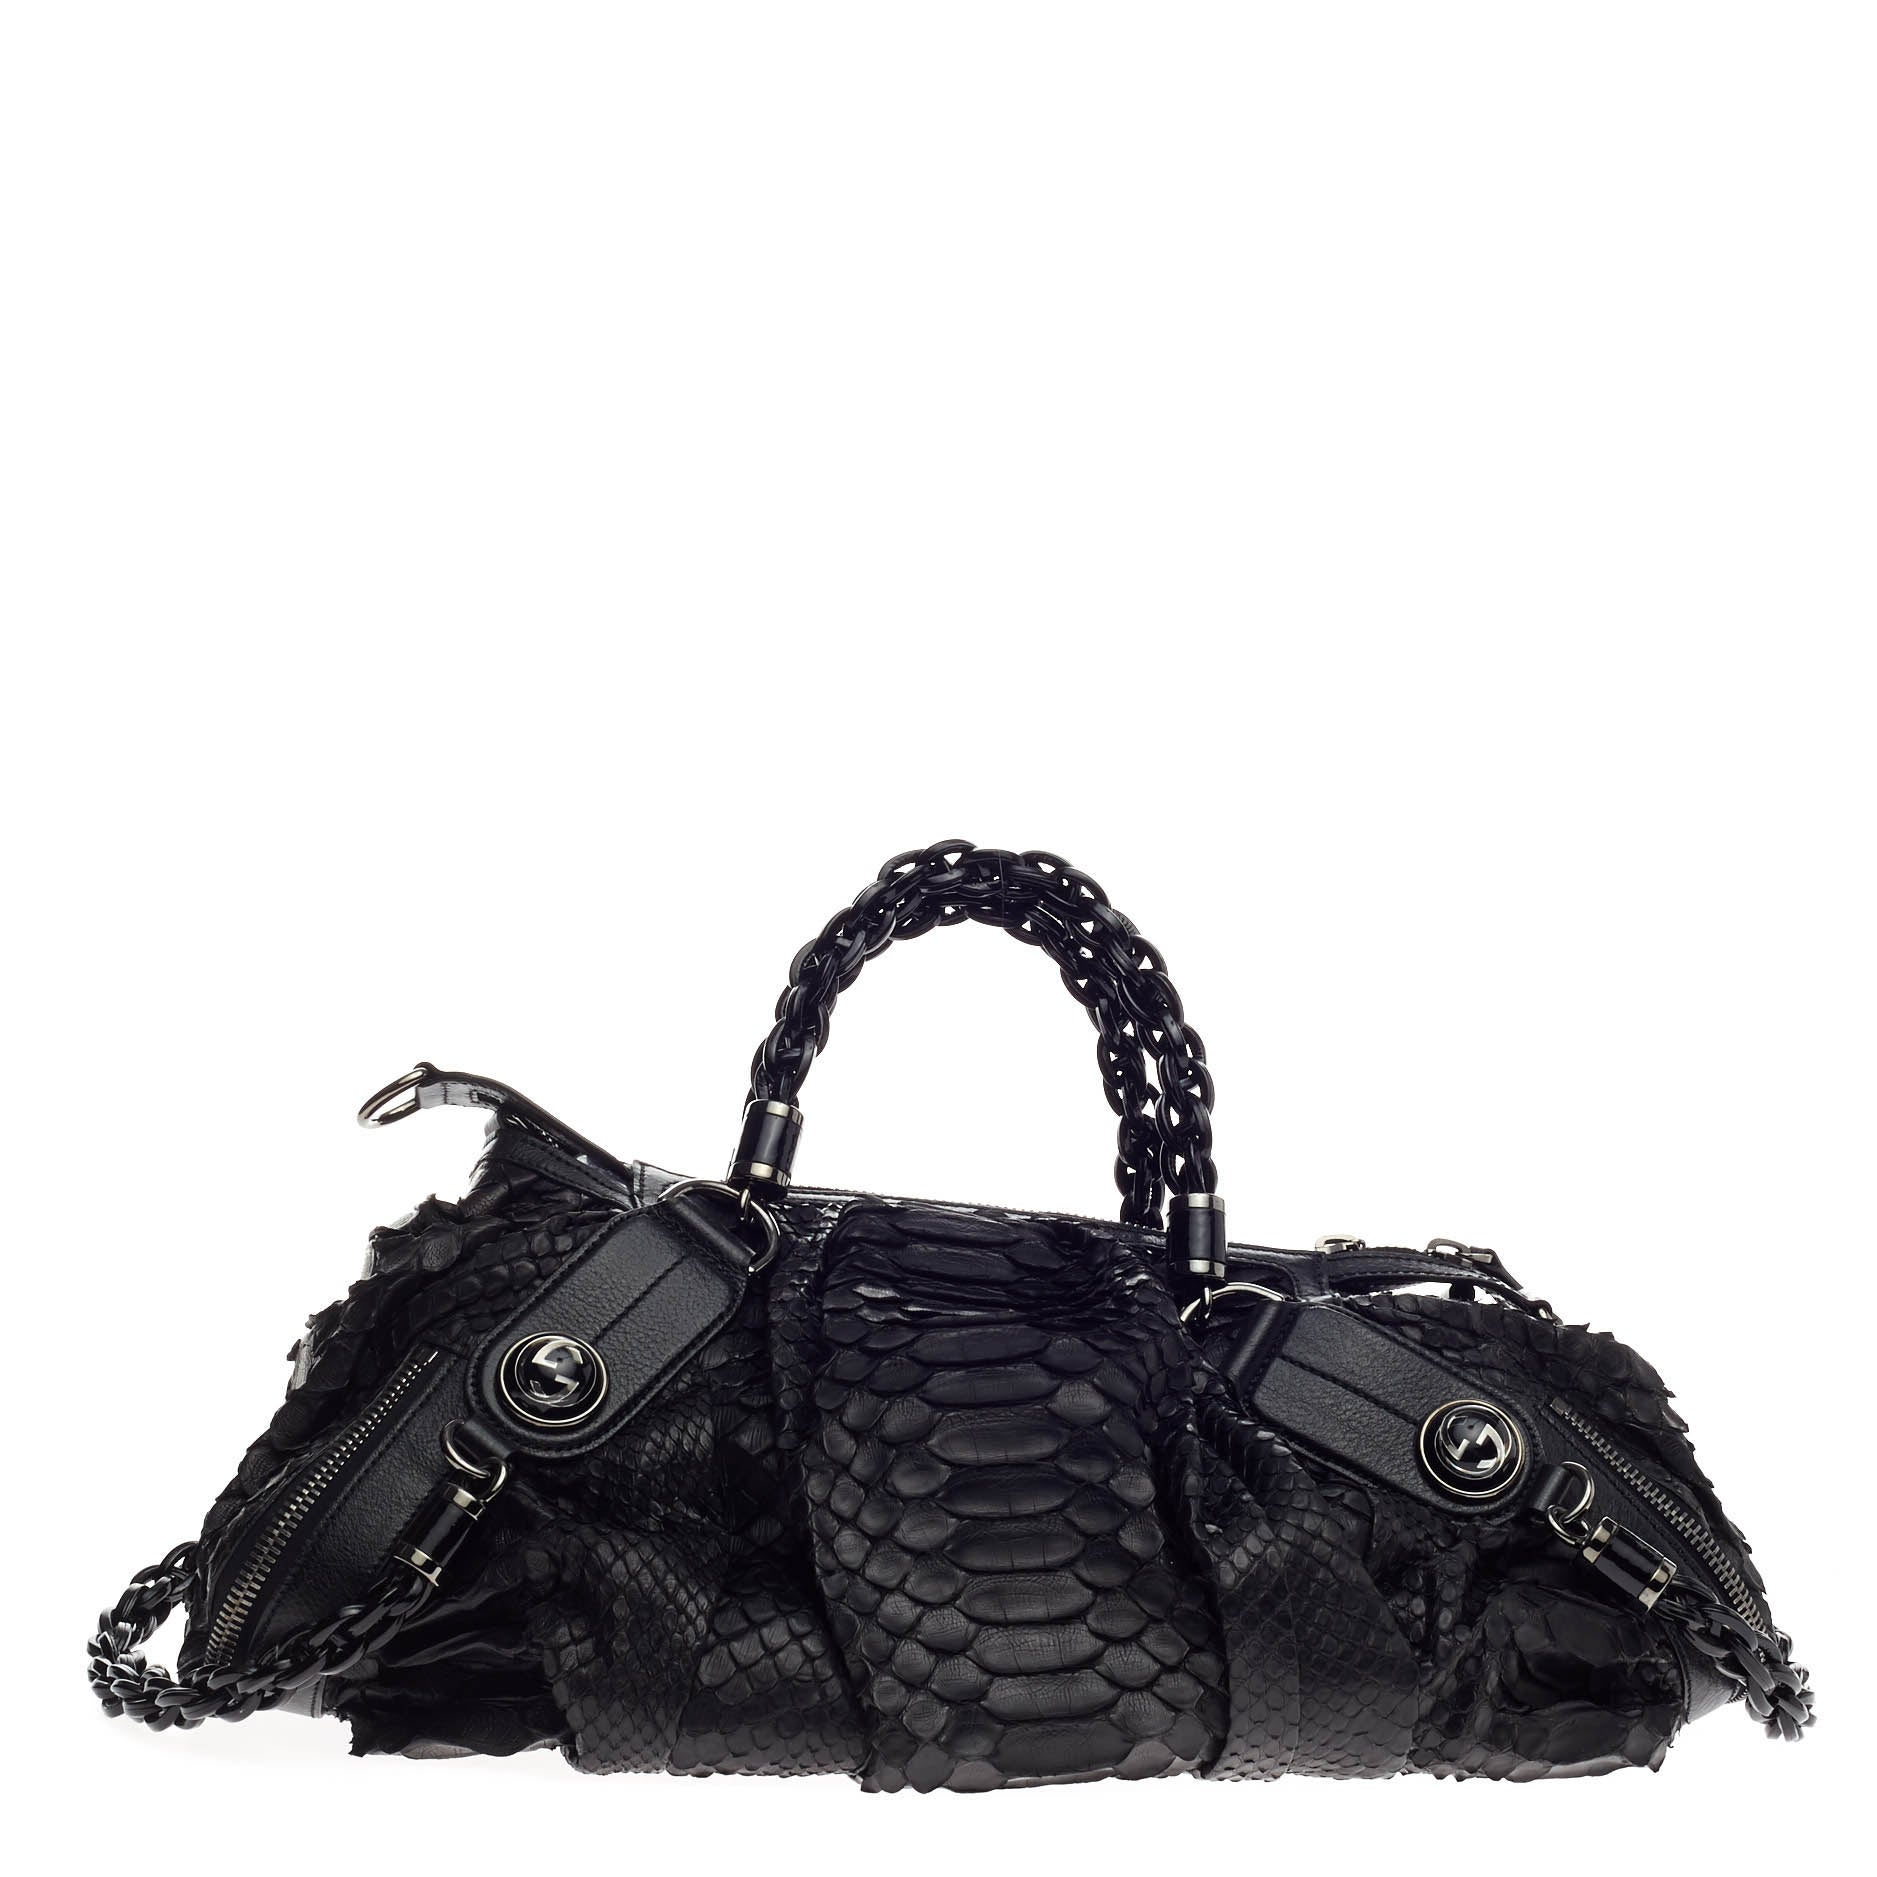 83570b033 Gucci Galaxy Convertible Satchel Python Medium at 1stdibs